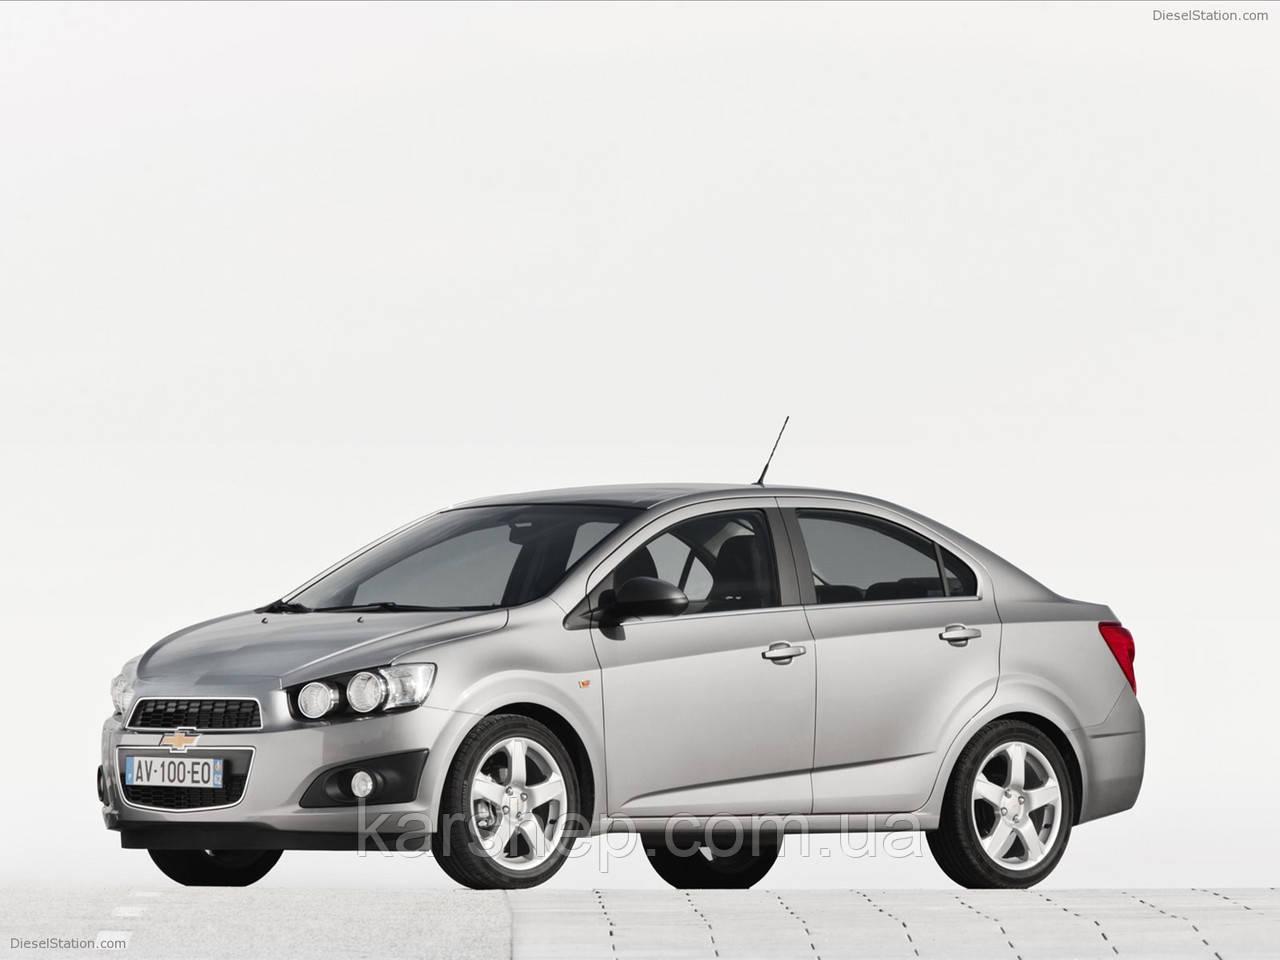 Ветровики для Chevrolet Aveo c 2011 г.в. Sedan